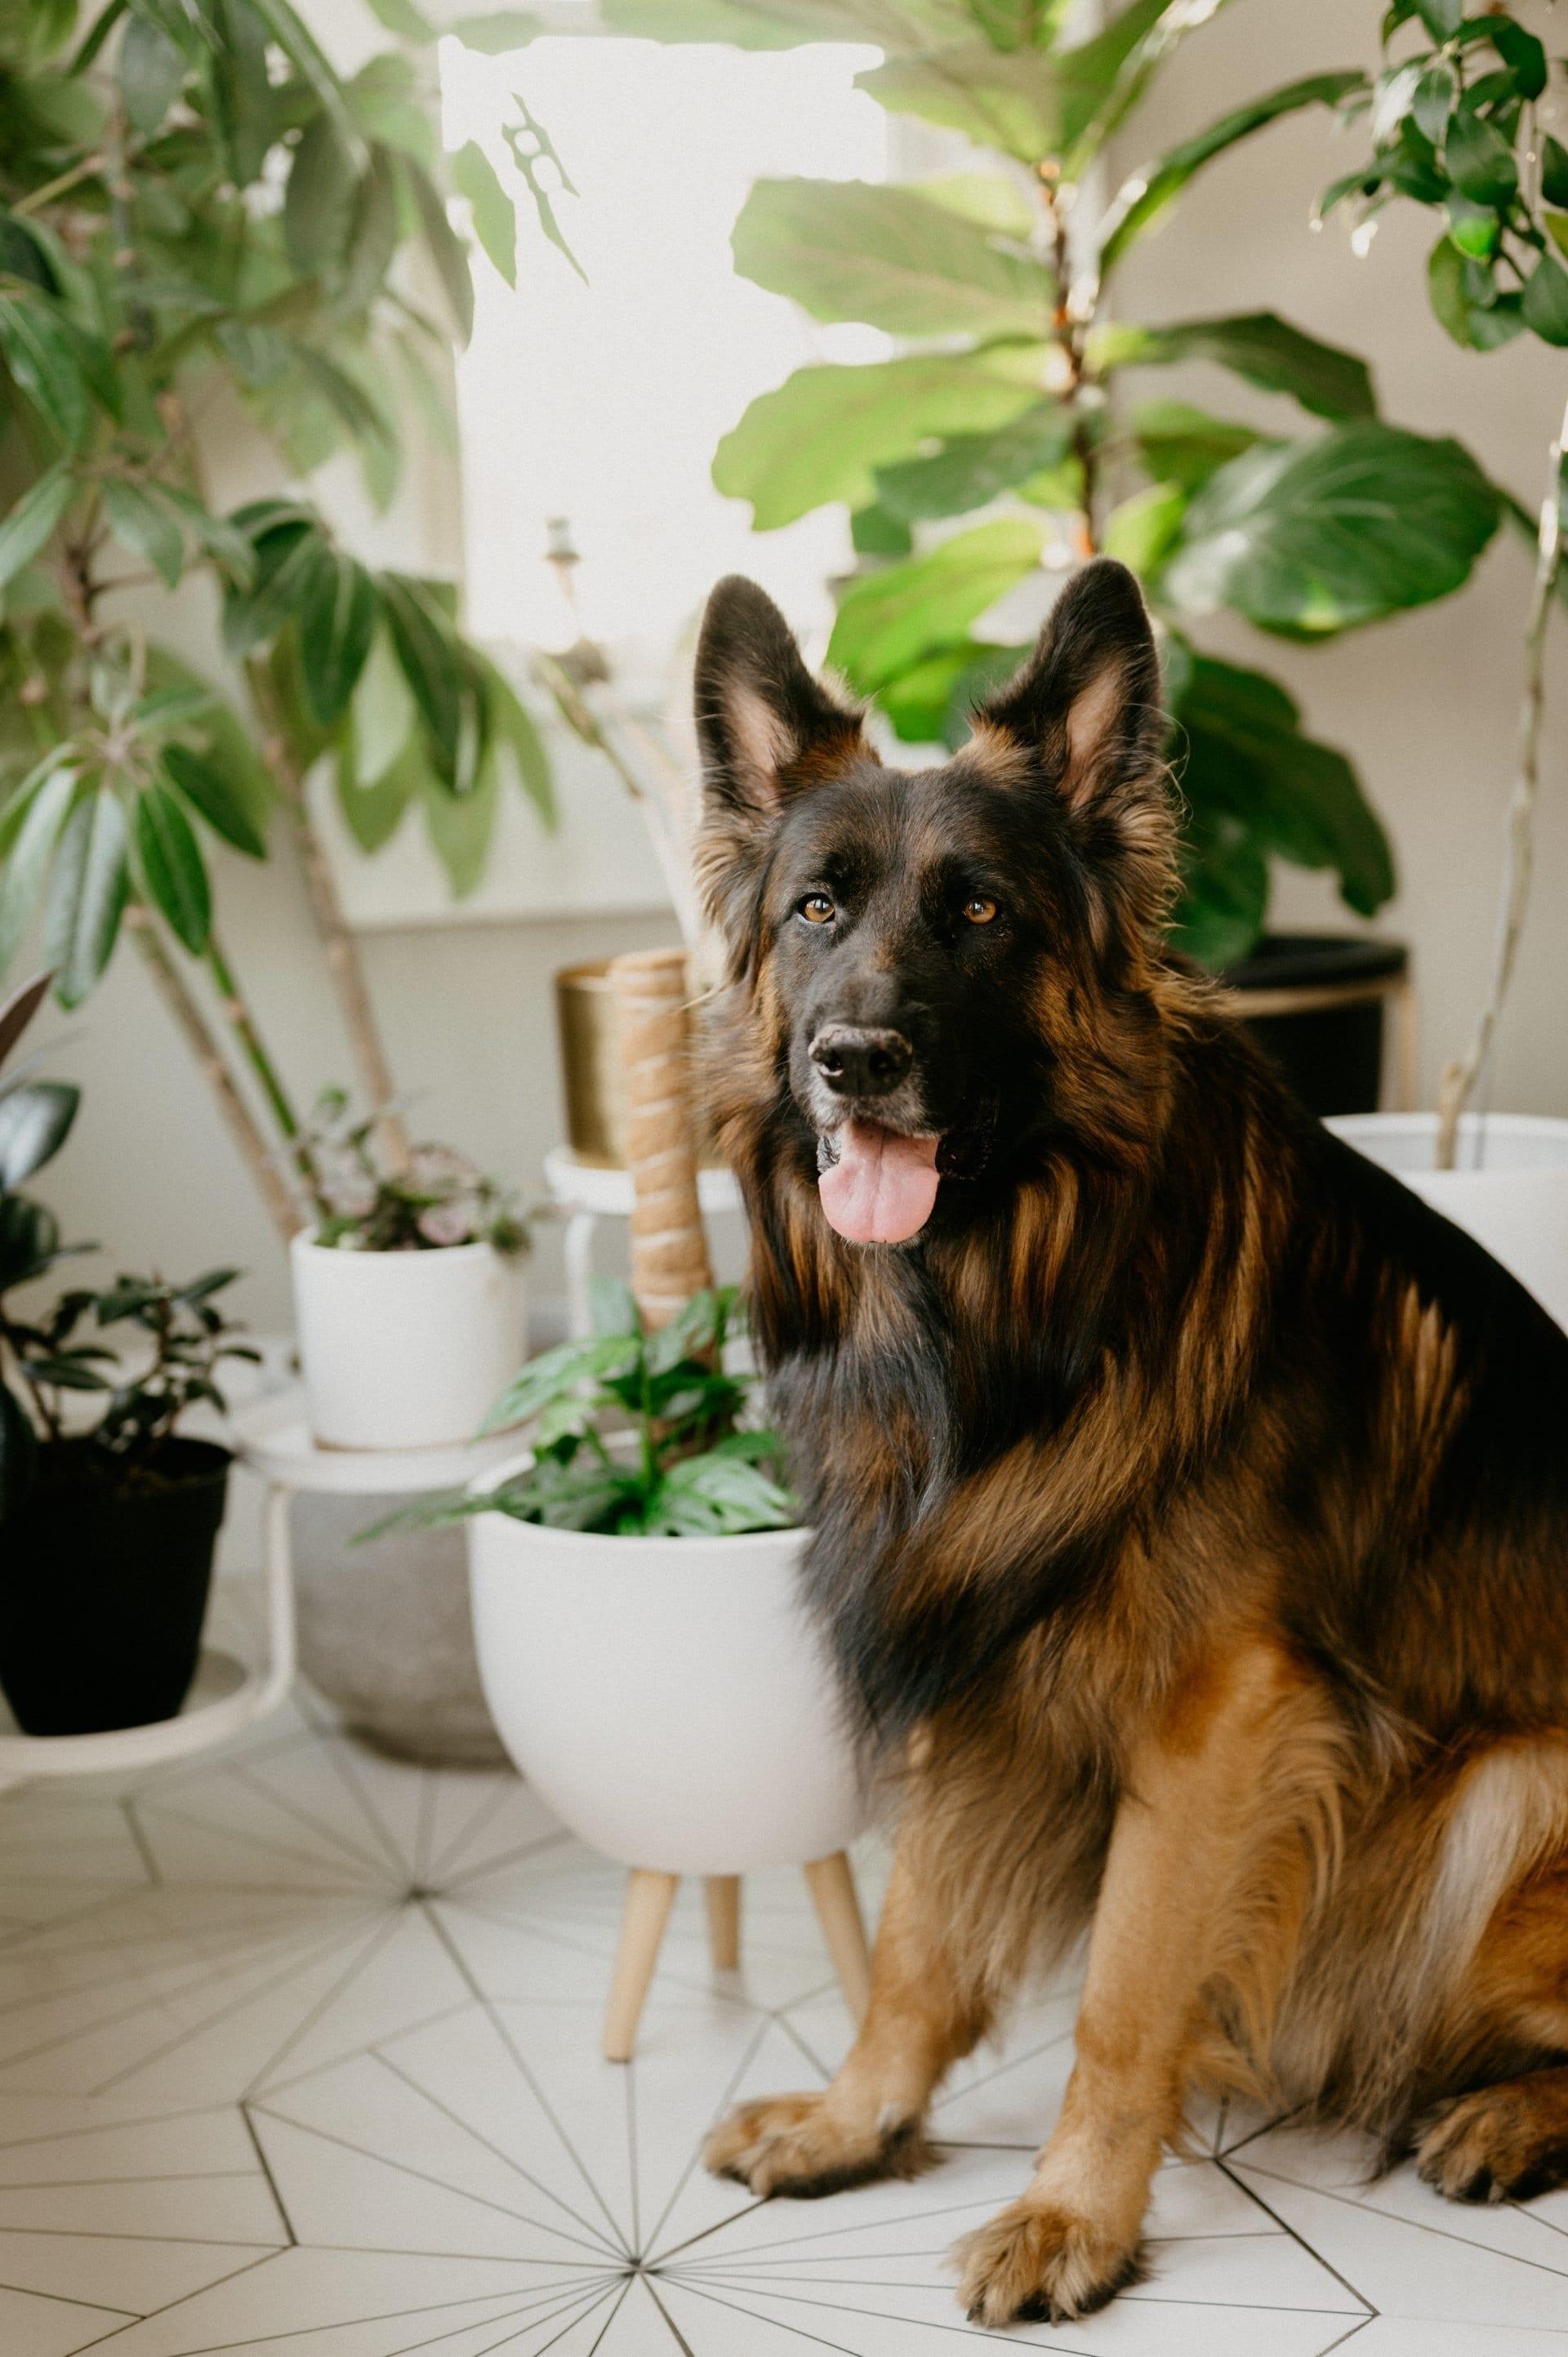 dog and houseplants